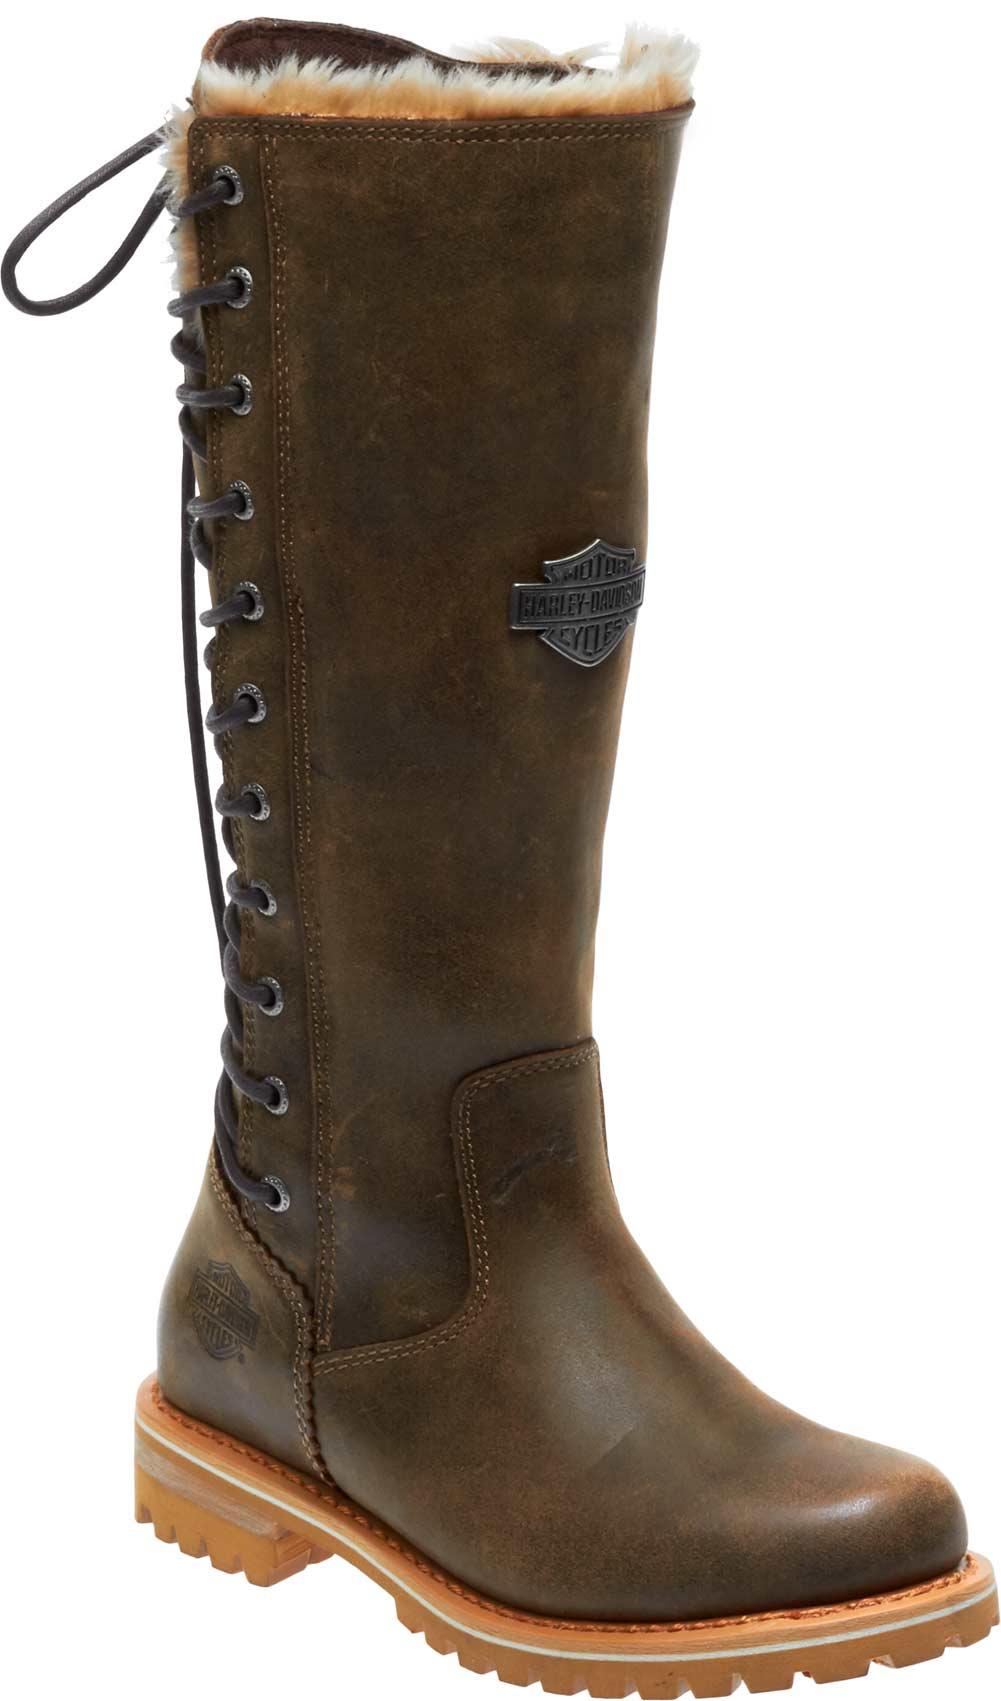 Black Women/'s Harley-Davidson Dorland Boots